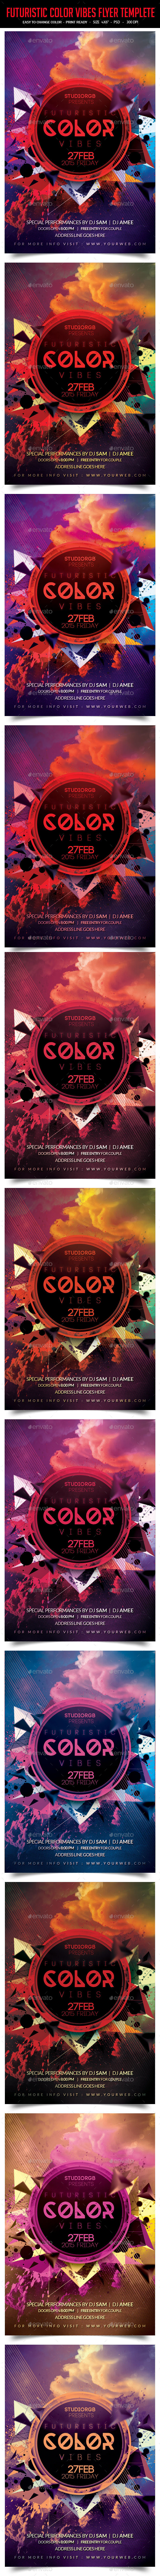 GraphicRiver Futuristic Color Vibes Flyer Template 10520521